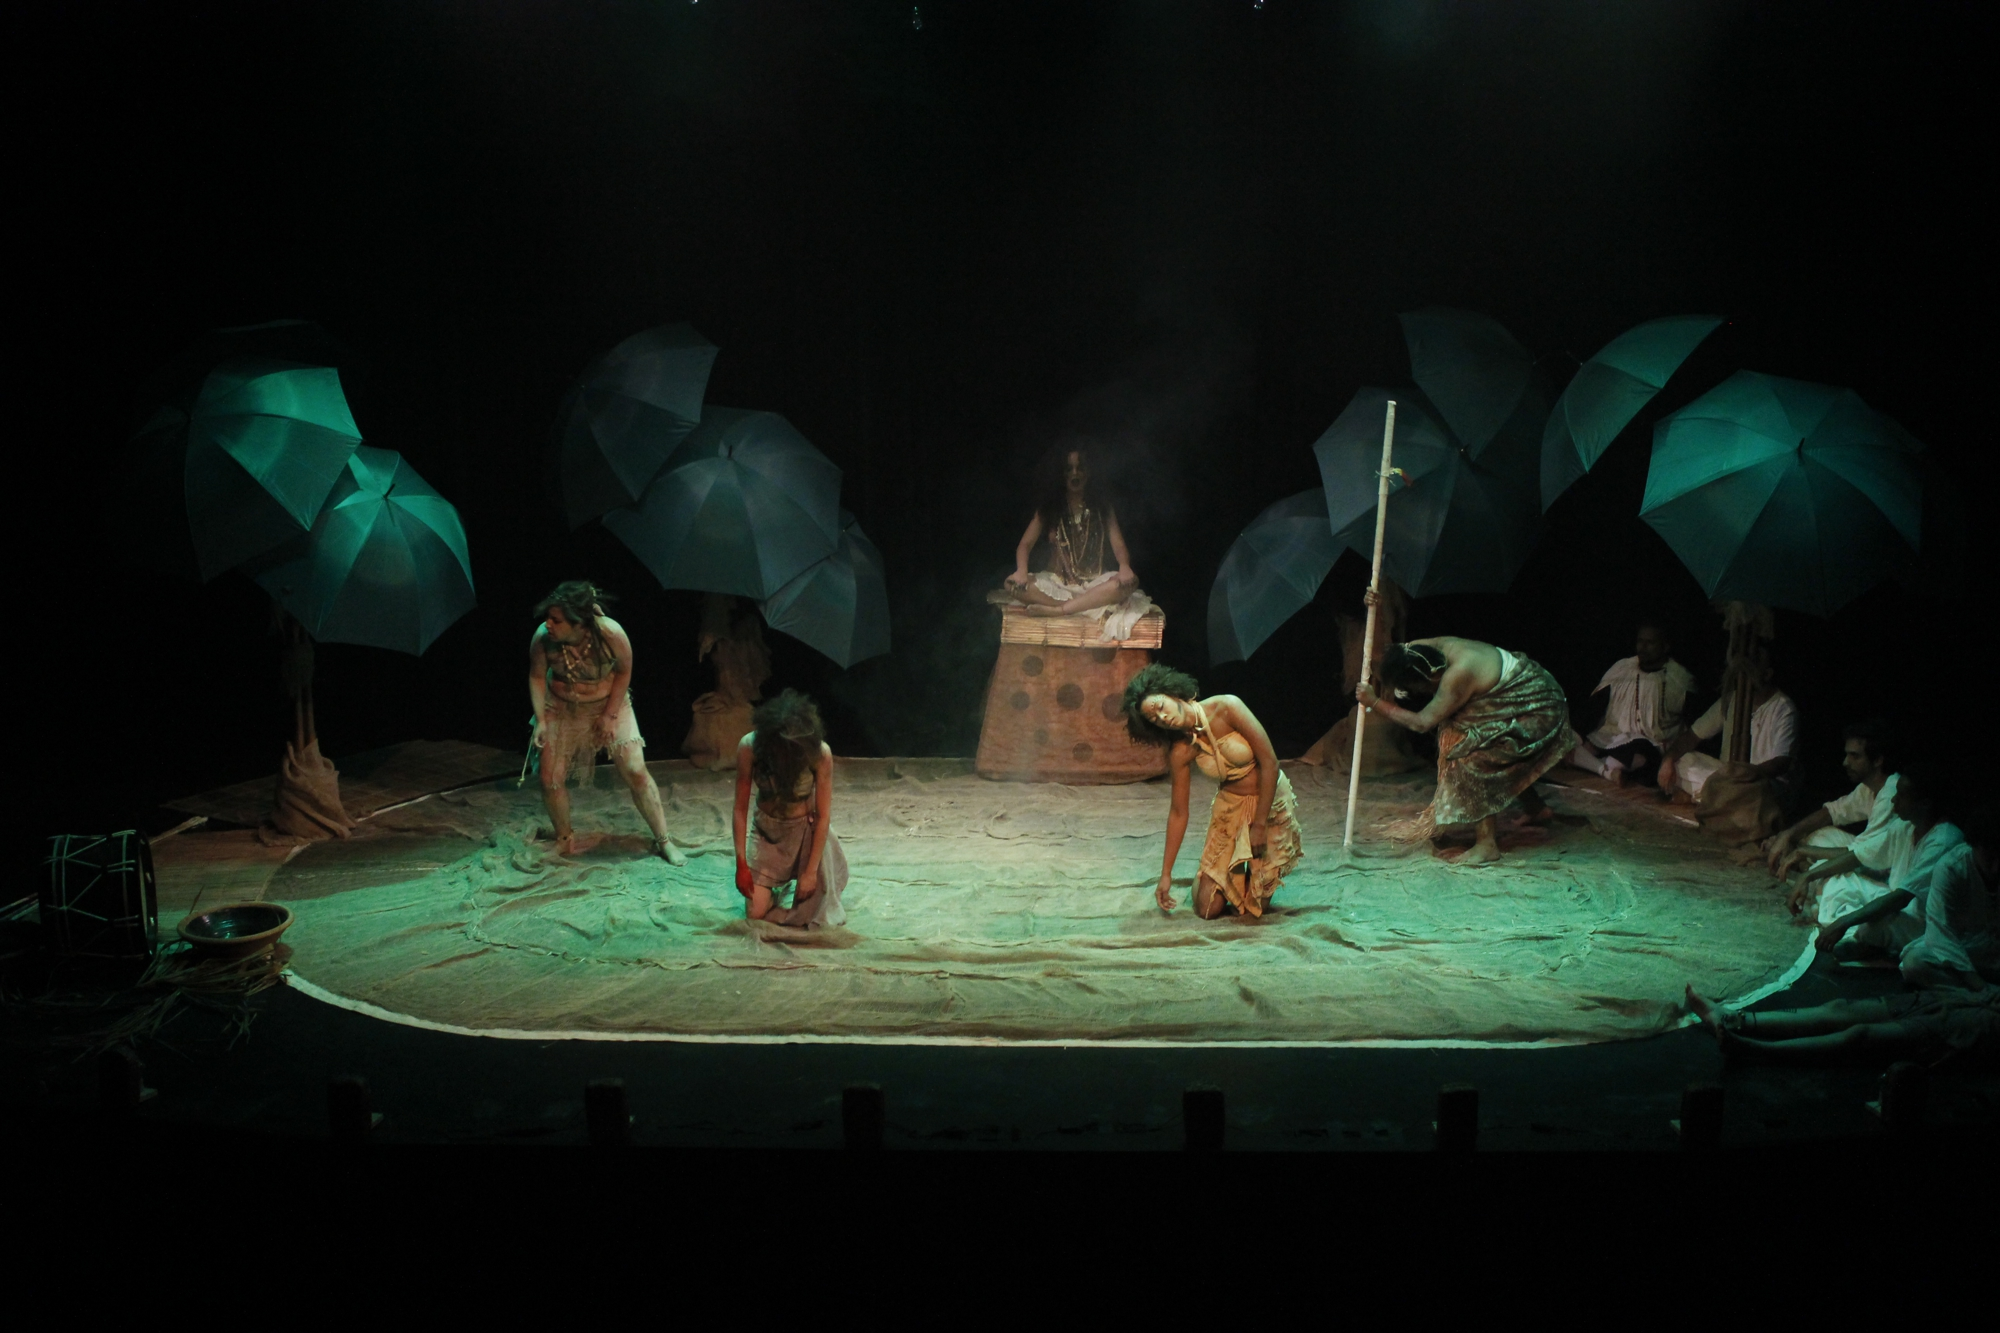 Sesi Vila das Merces - Terra brasilis - 2013 - site Cultura Osasco